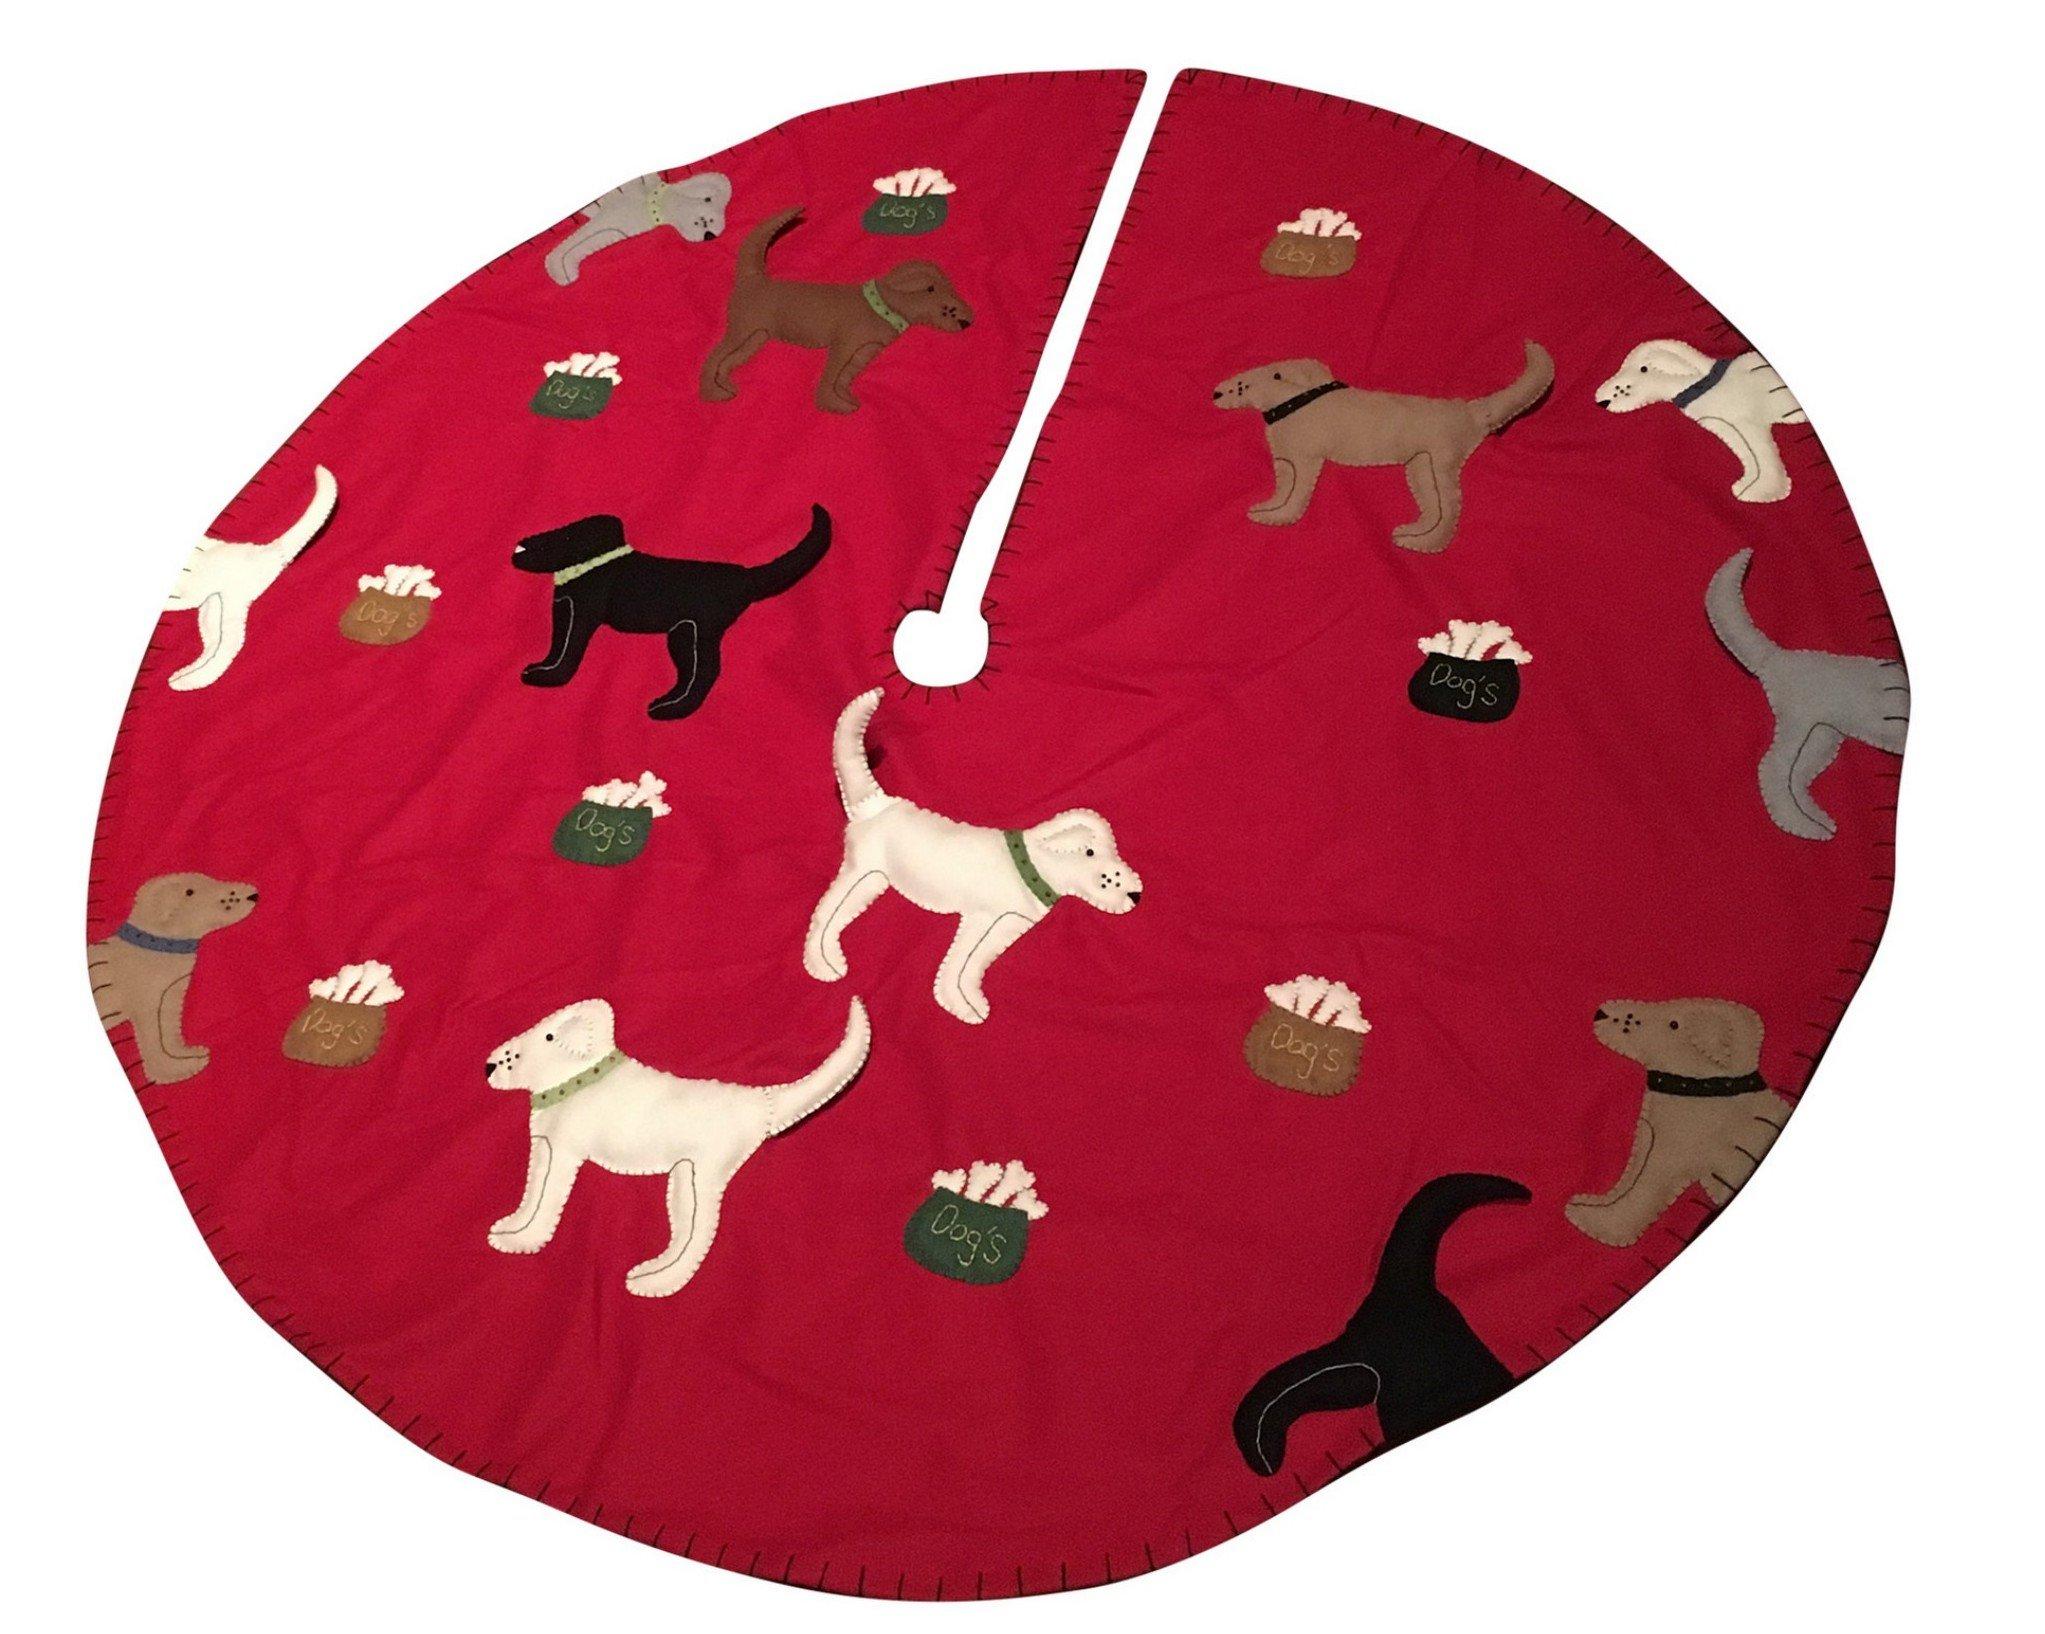 54'' Handmade Felt Applique Dog Pet Christmas Tree Skirt Red Background